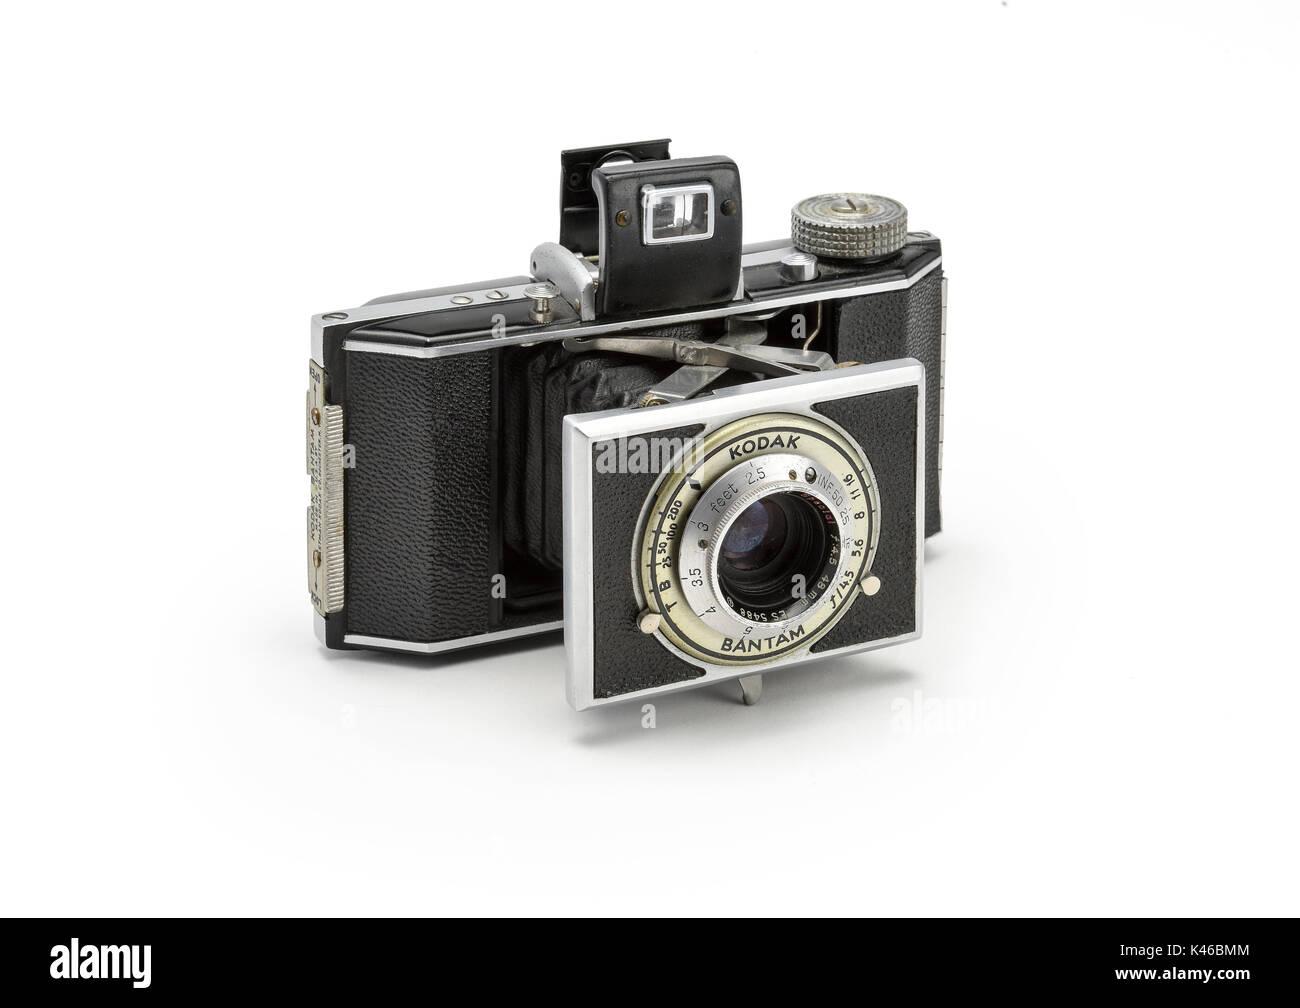 Vintage Kodak Bantam 828 Folding Film Camera from the 1930's - Stock Image